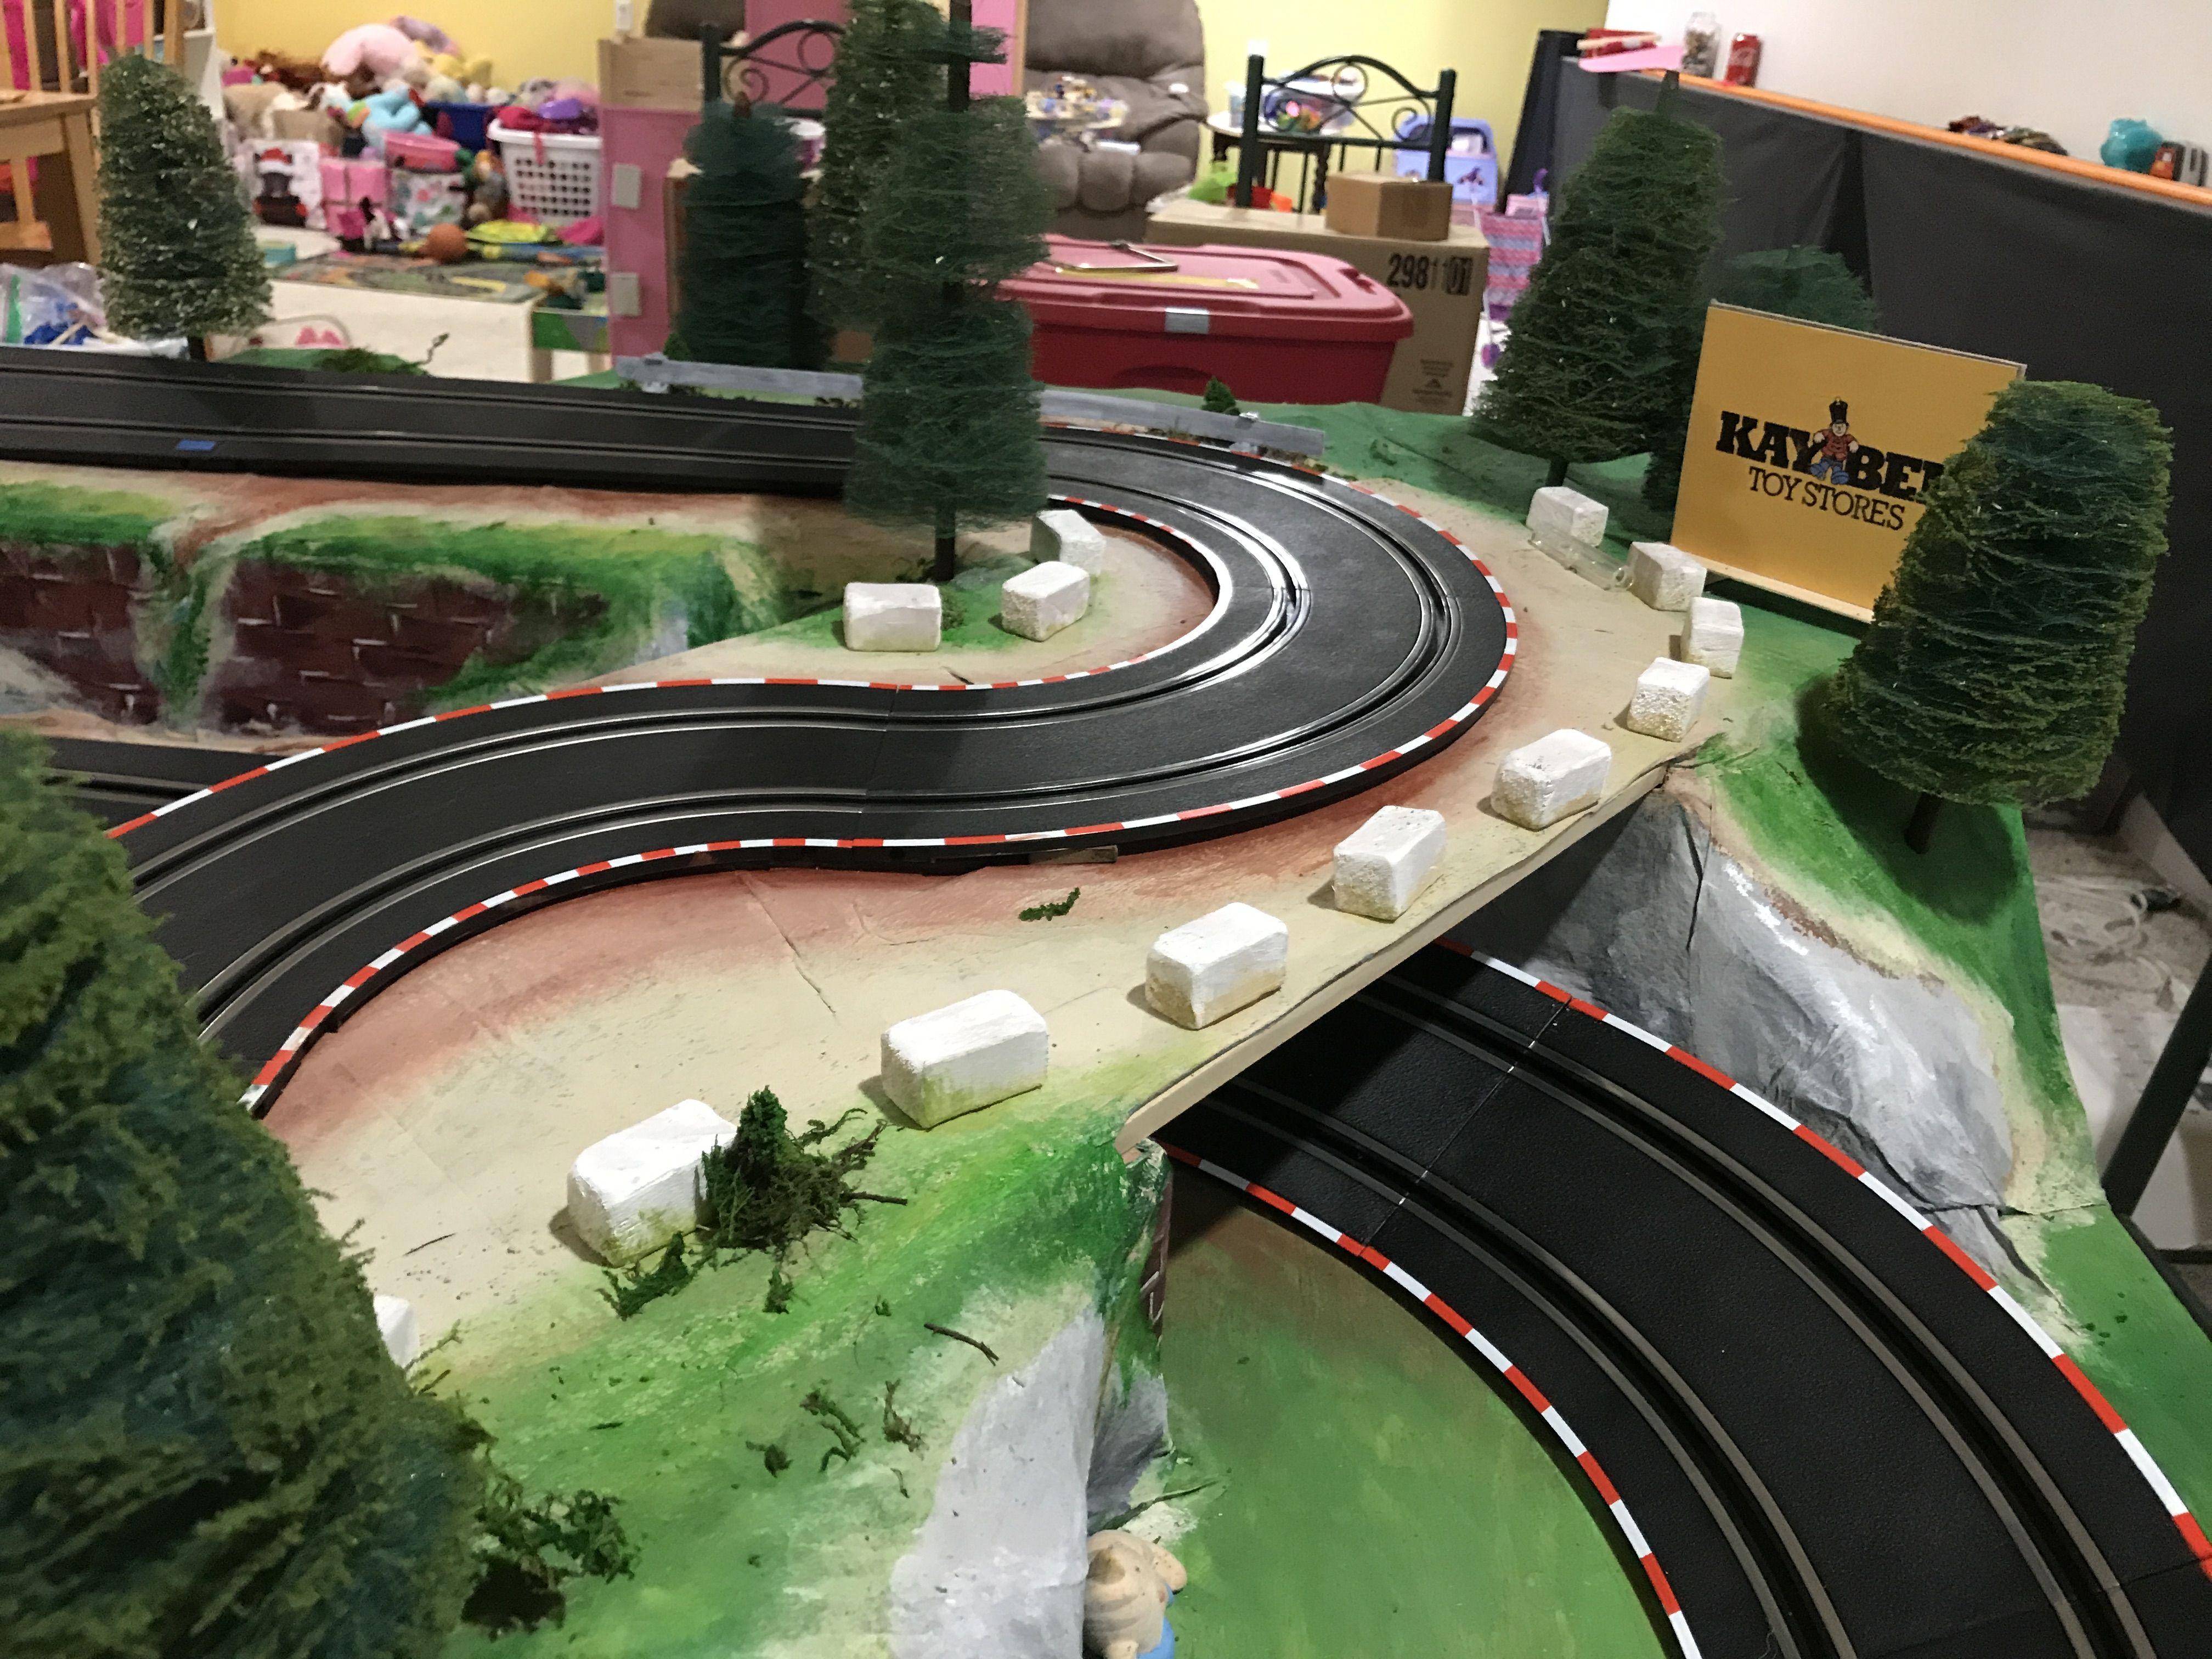 Carrera Go 1 43 Slot Car Track Slot Cars Slot Car Tracks Slot Car Tracks Building